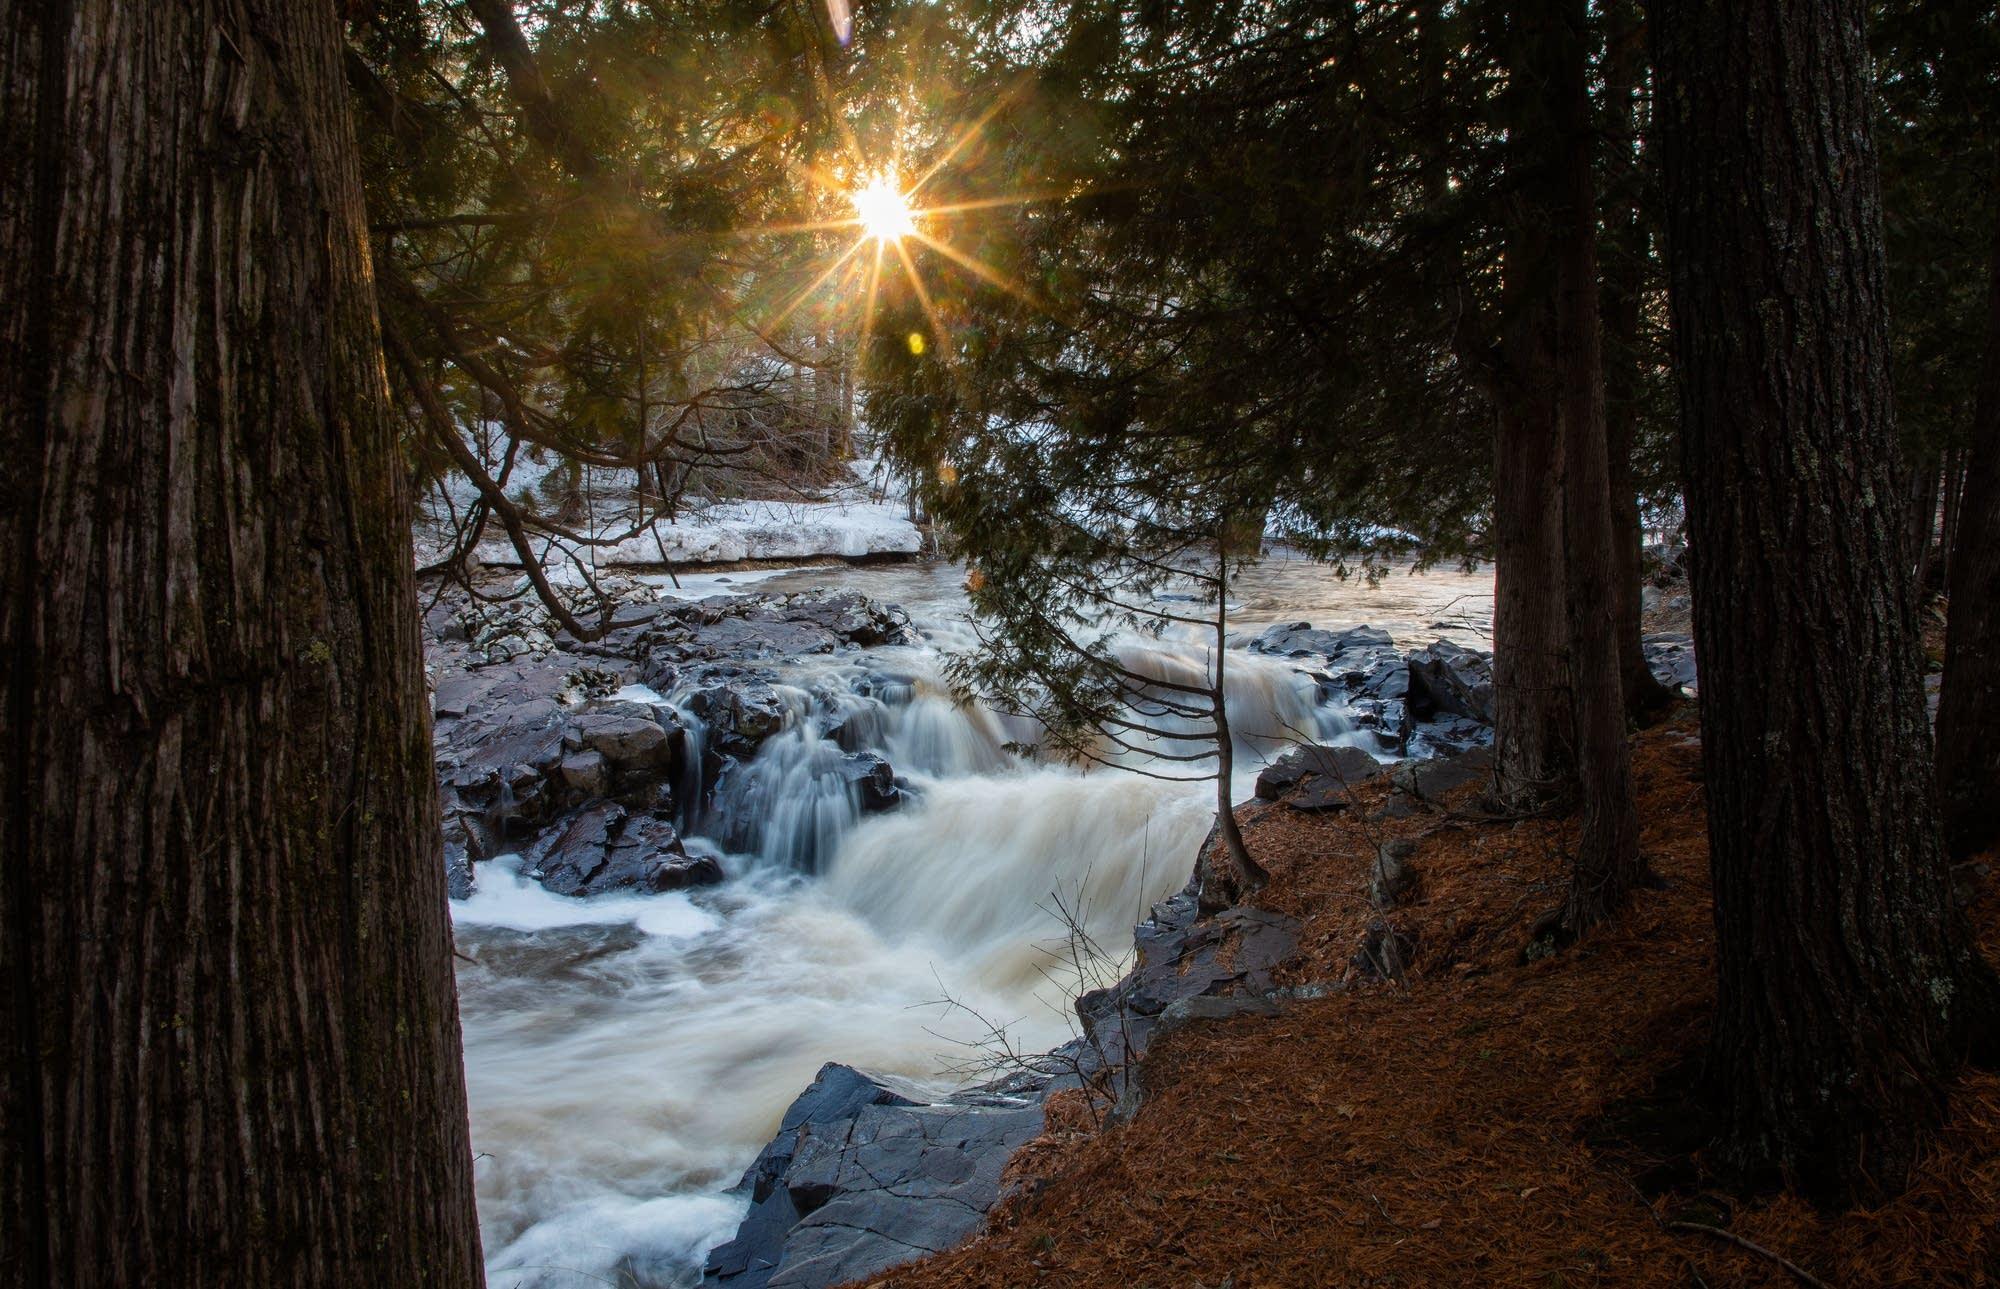 he evening sun shines through the trees along Amity Creek.